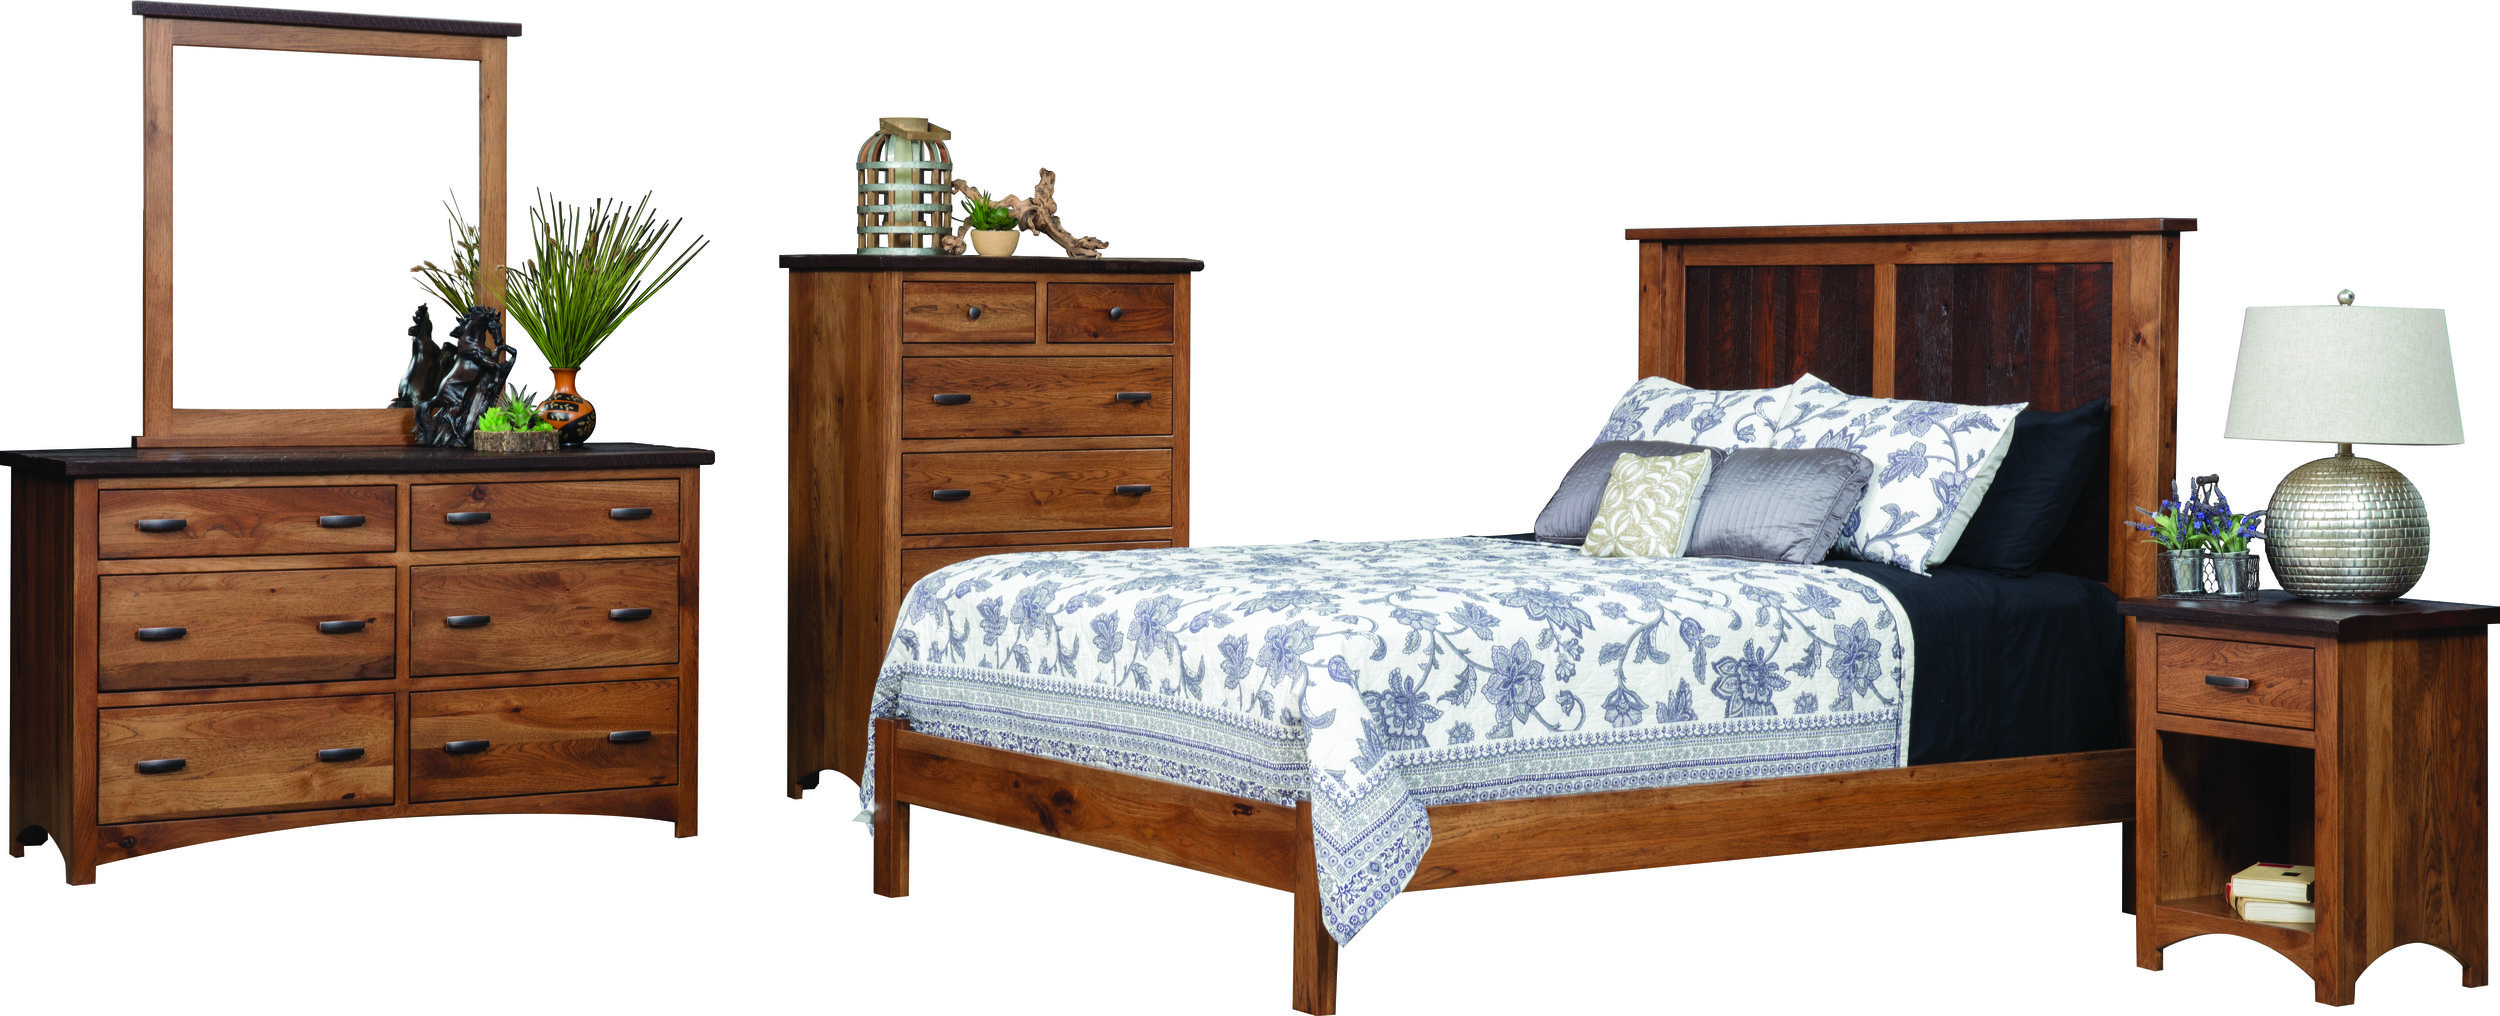 Manhattan_Bedroom_Collection-Standard.jpg